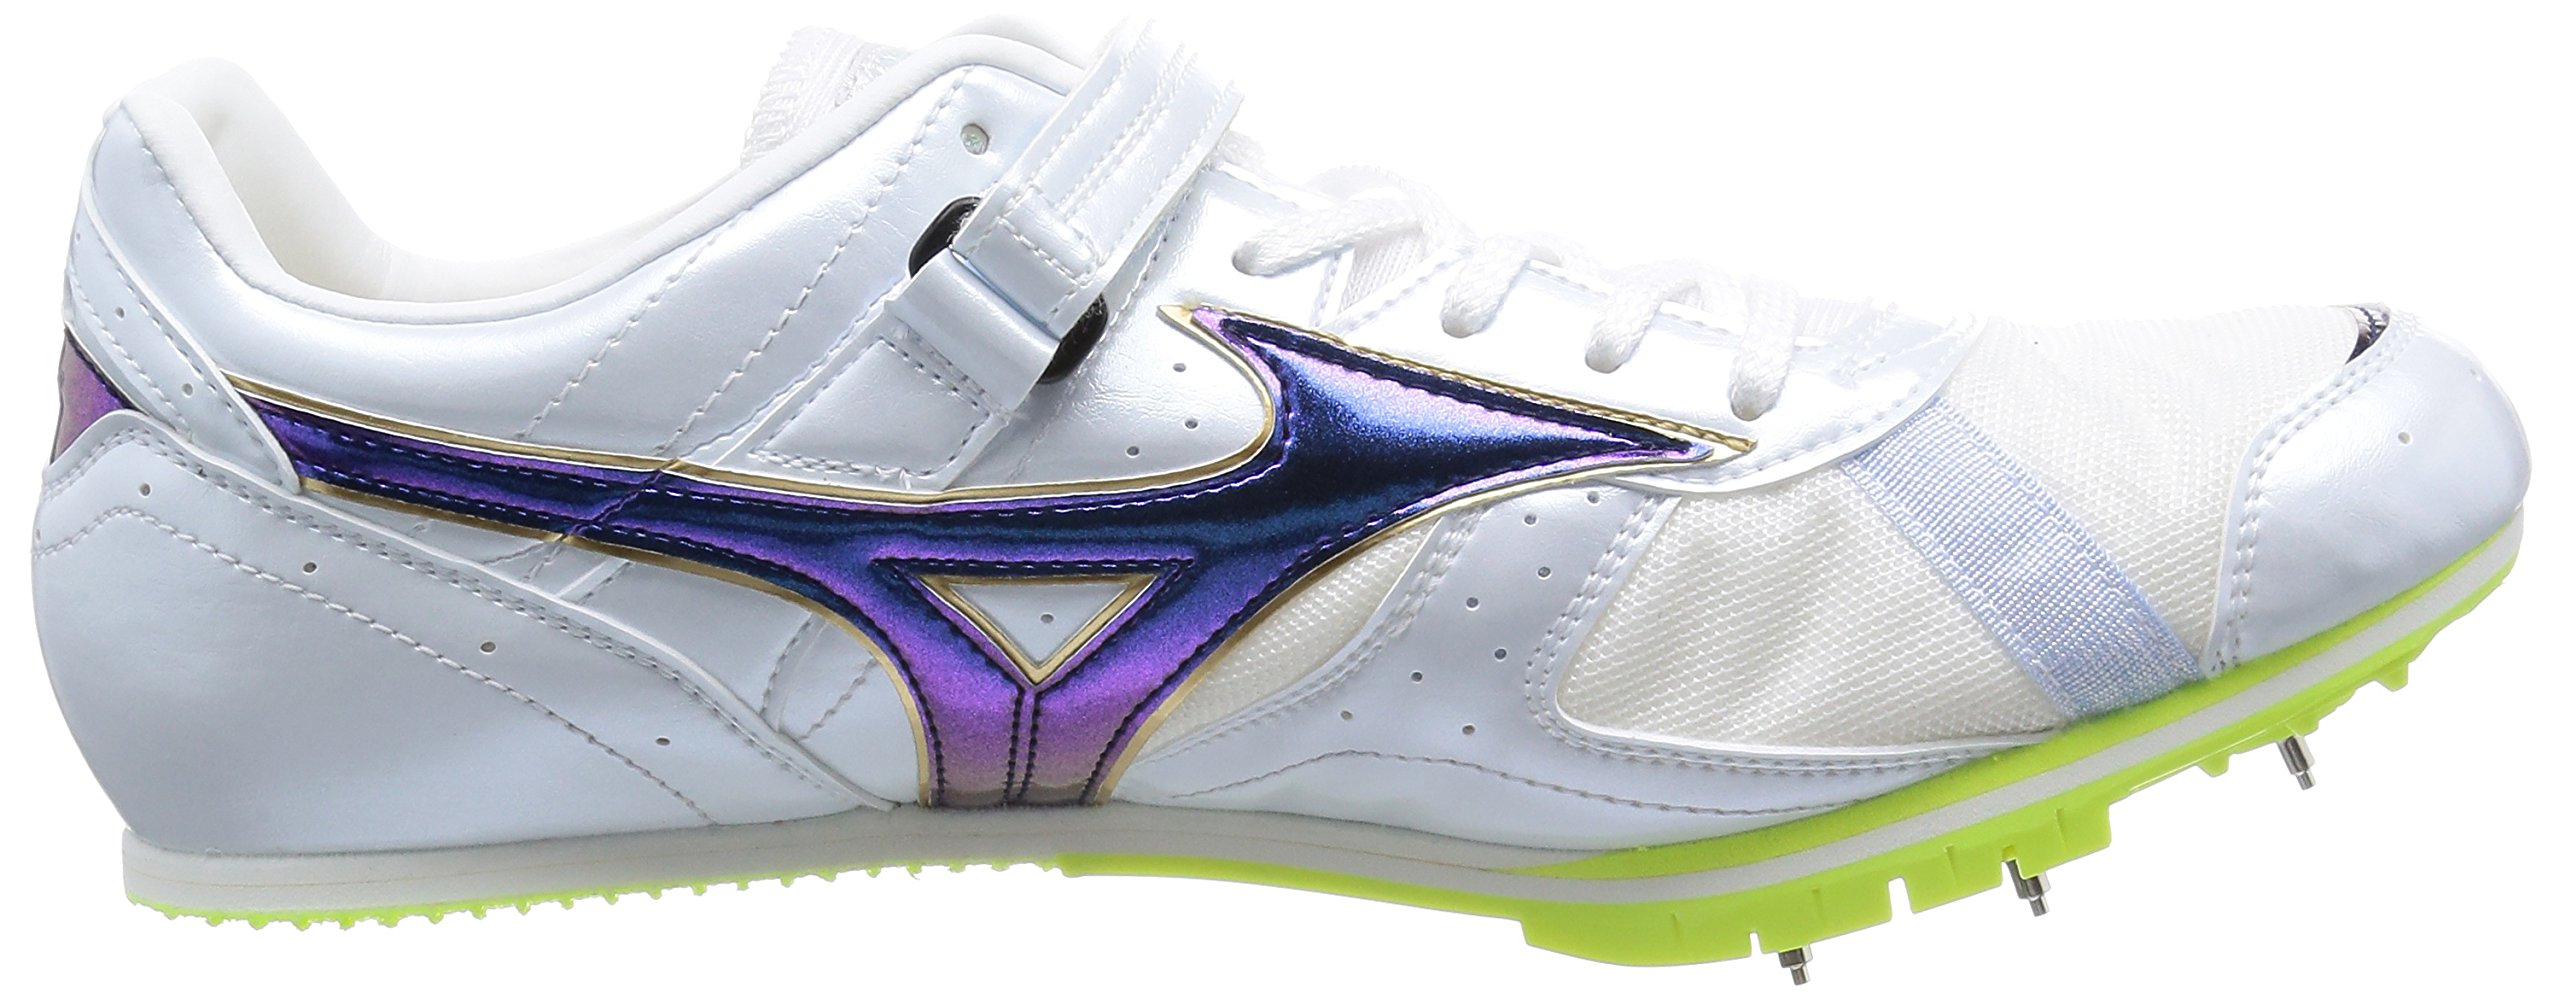 Mizuno Men's Field GEO LJ Track Shoes Yellow US 10.5 by Mizuno (Image #6)